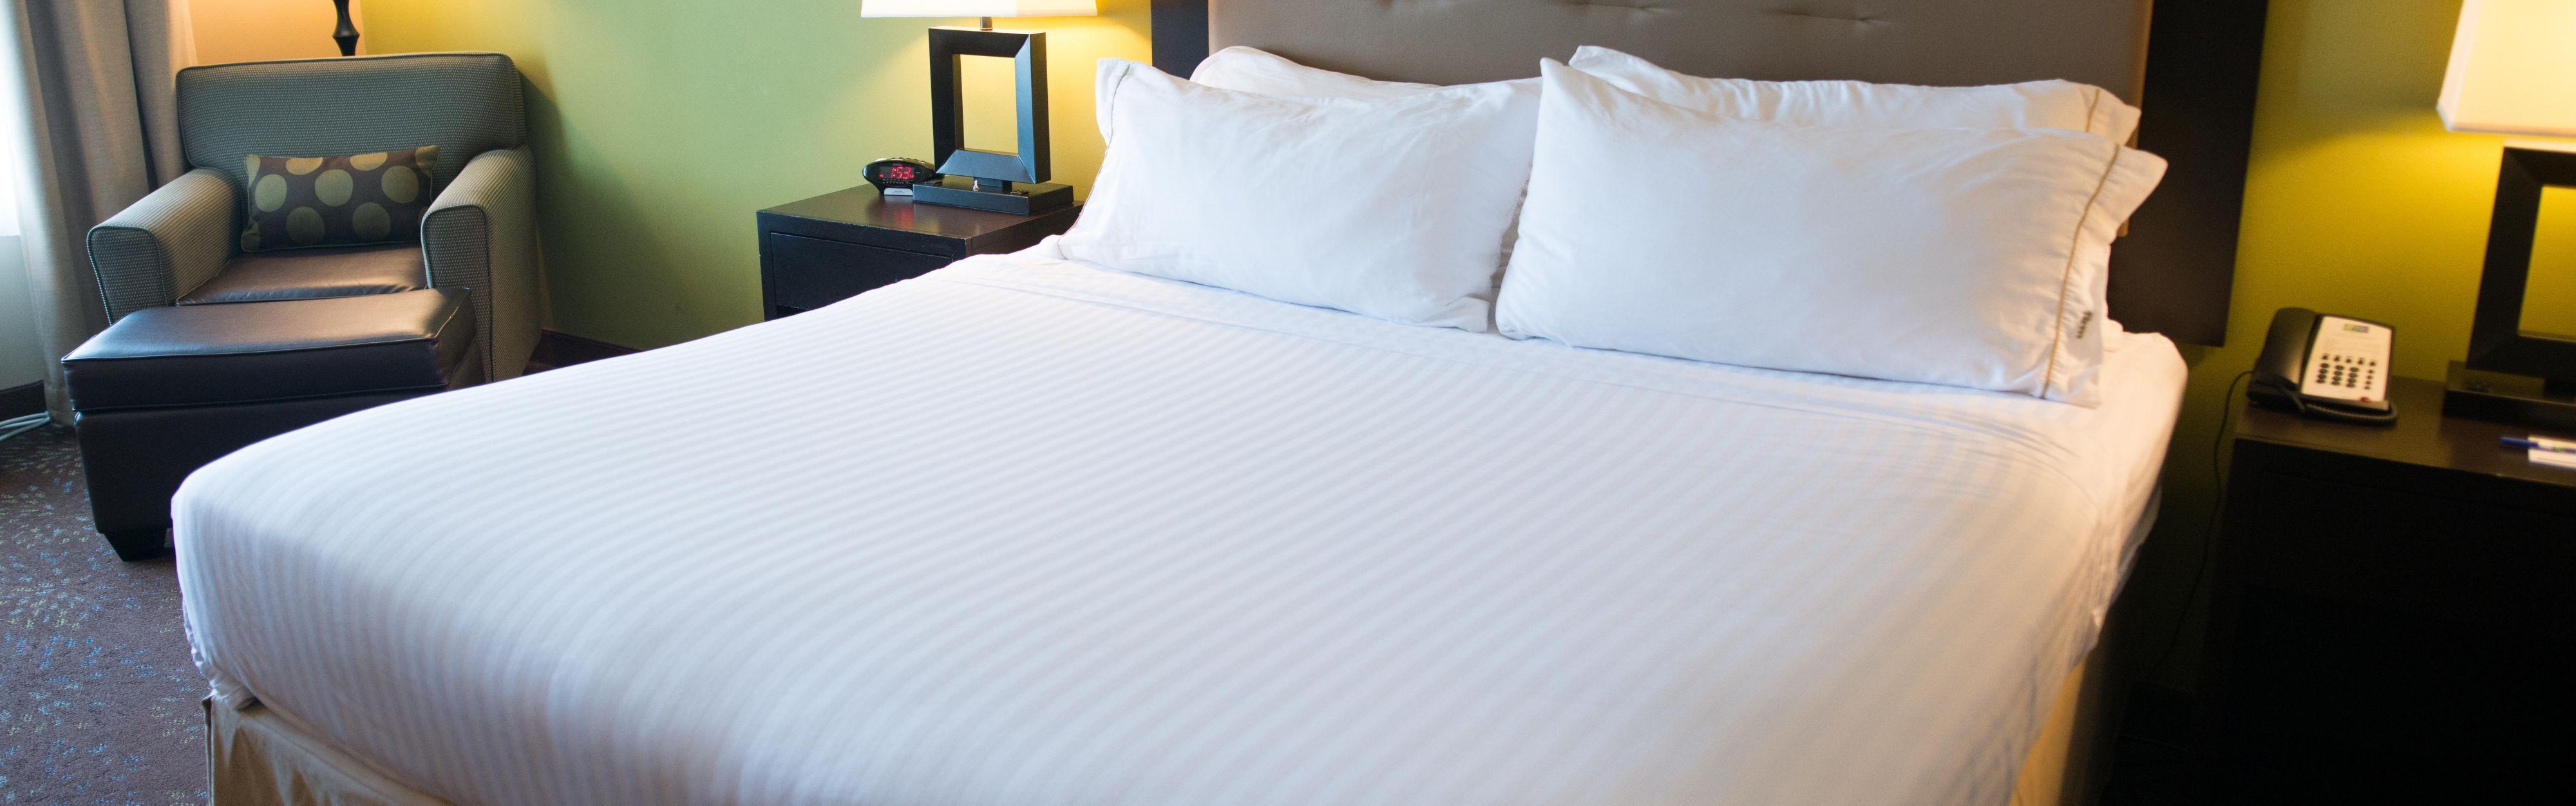 Holiday Inn Express & Suites Northwood image 1